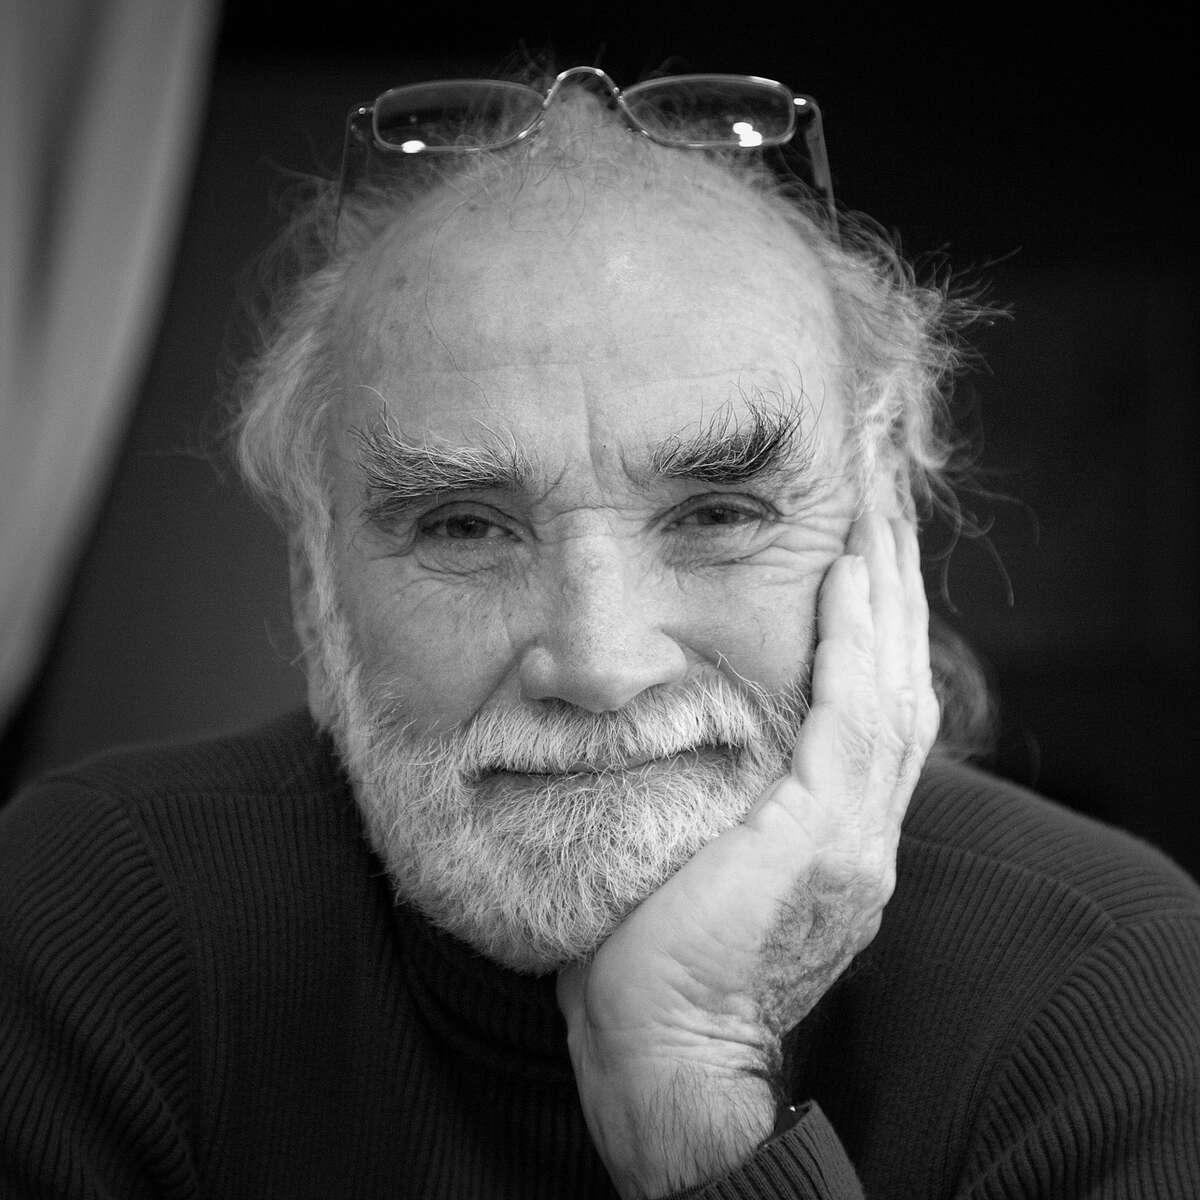 A portrait of award-winning photojournalist and activist Matthew Herron.